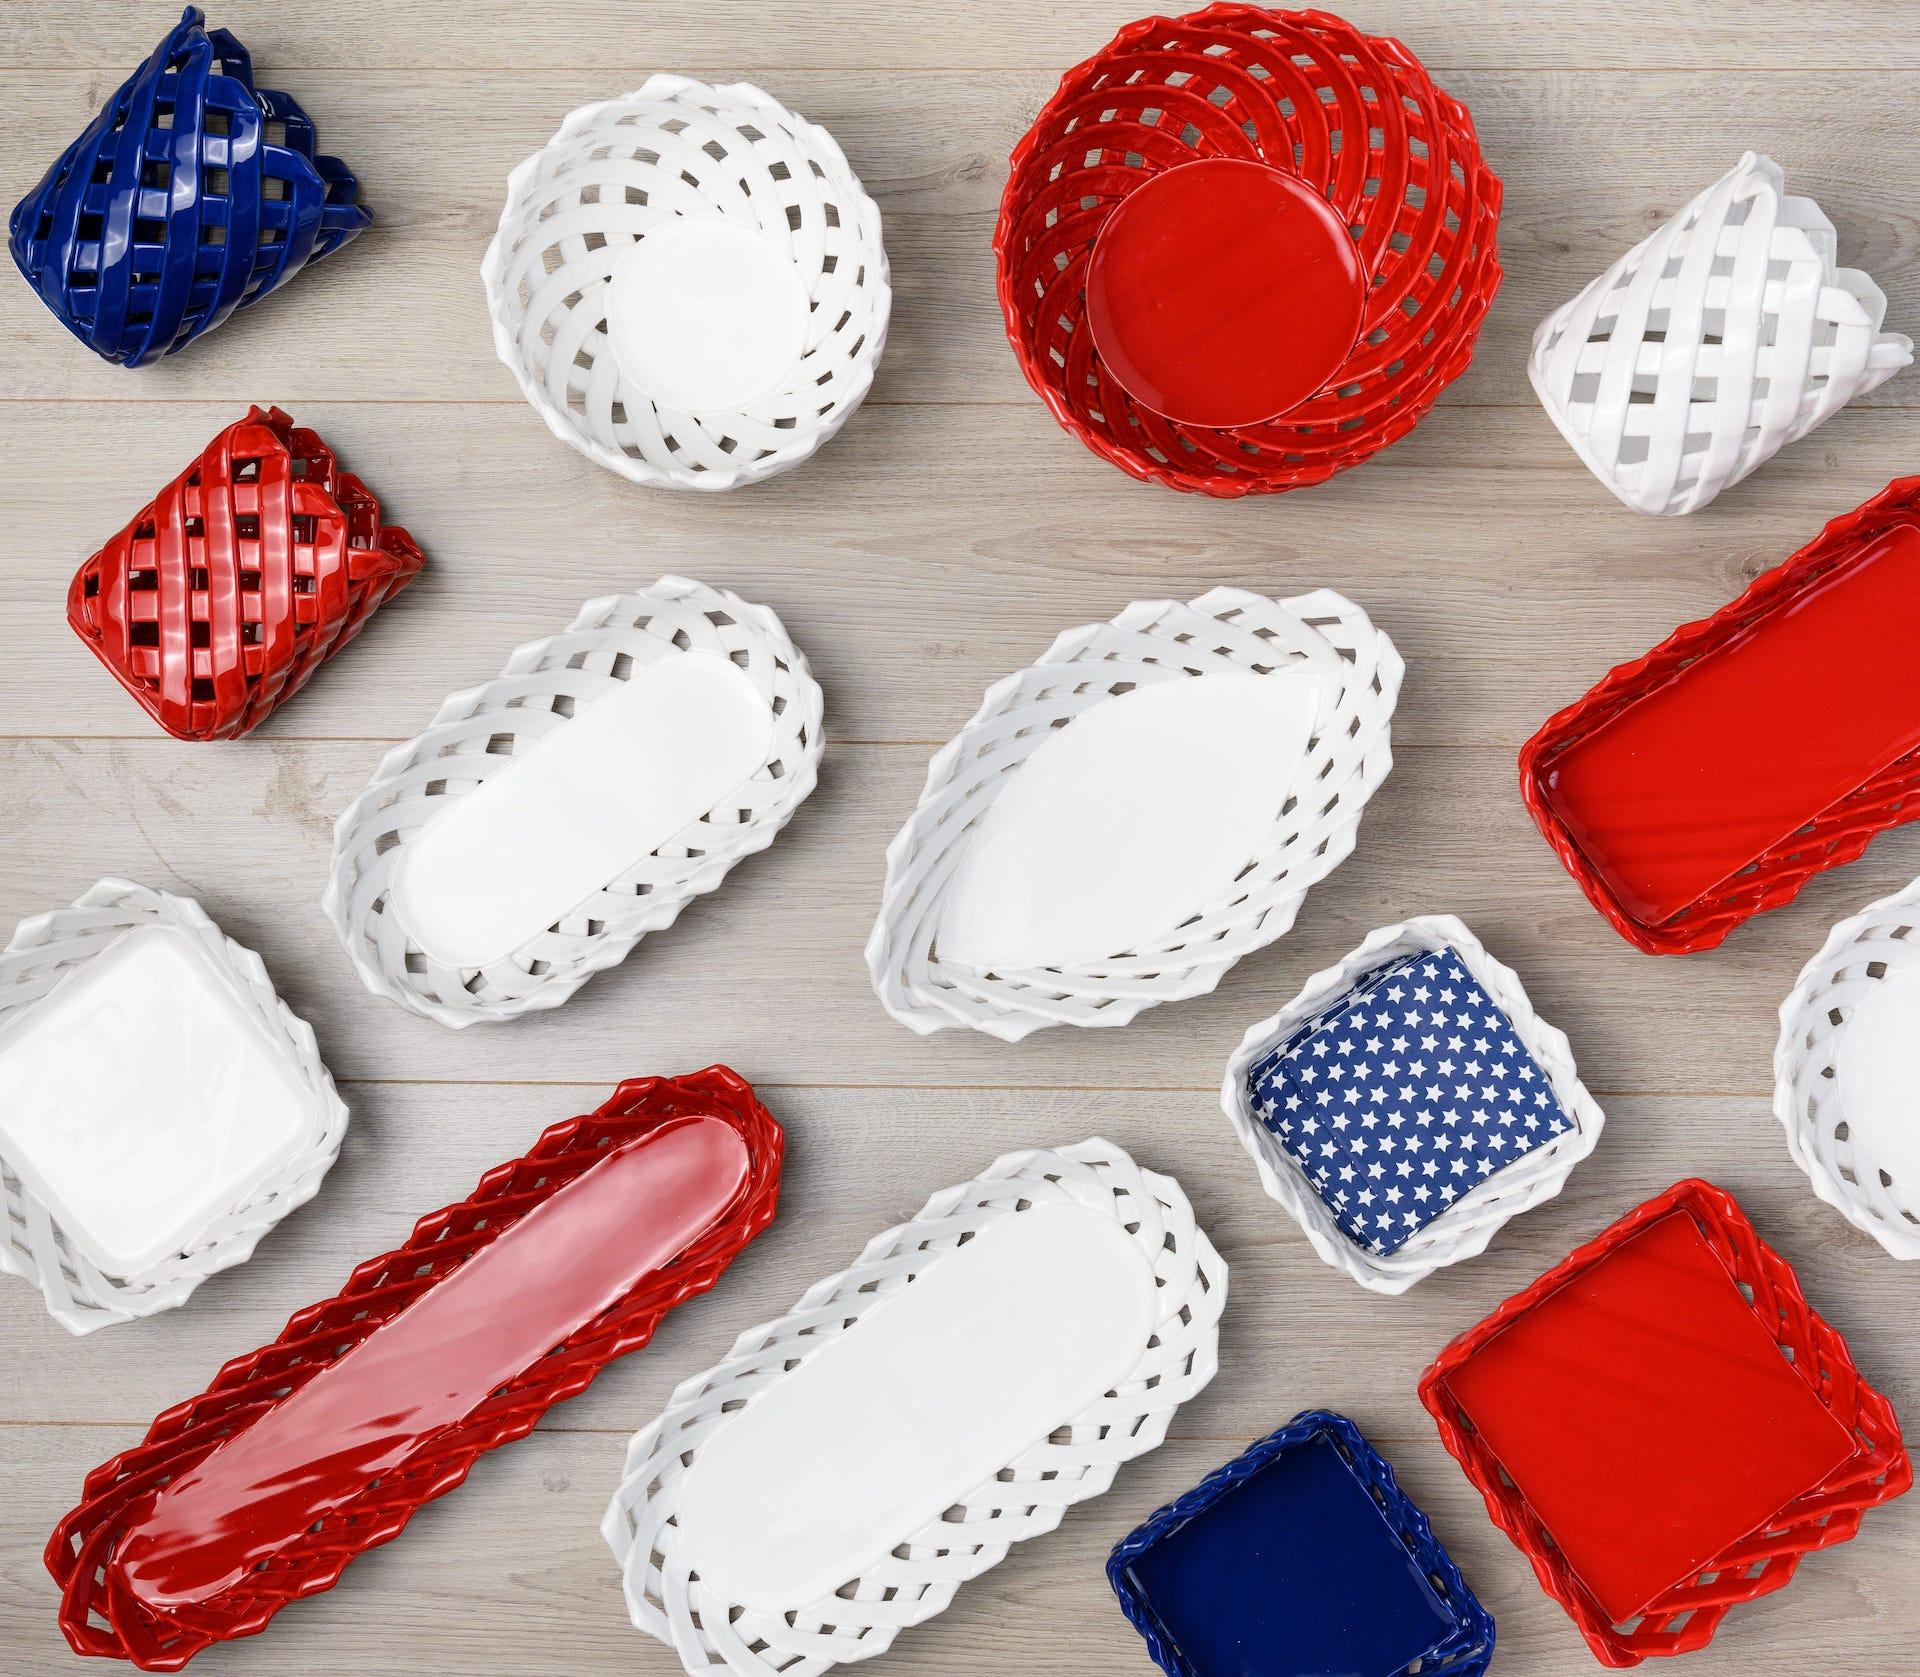 Ceramic Woven Baskets